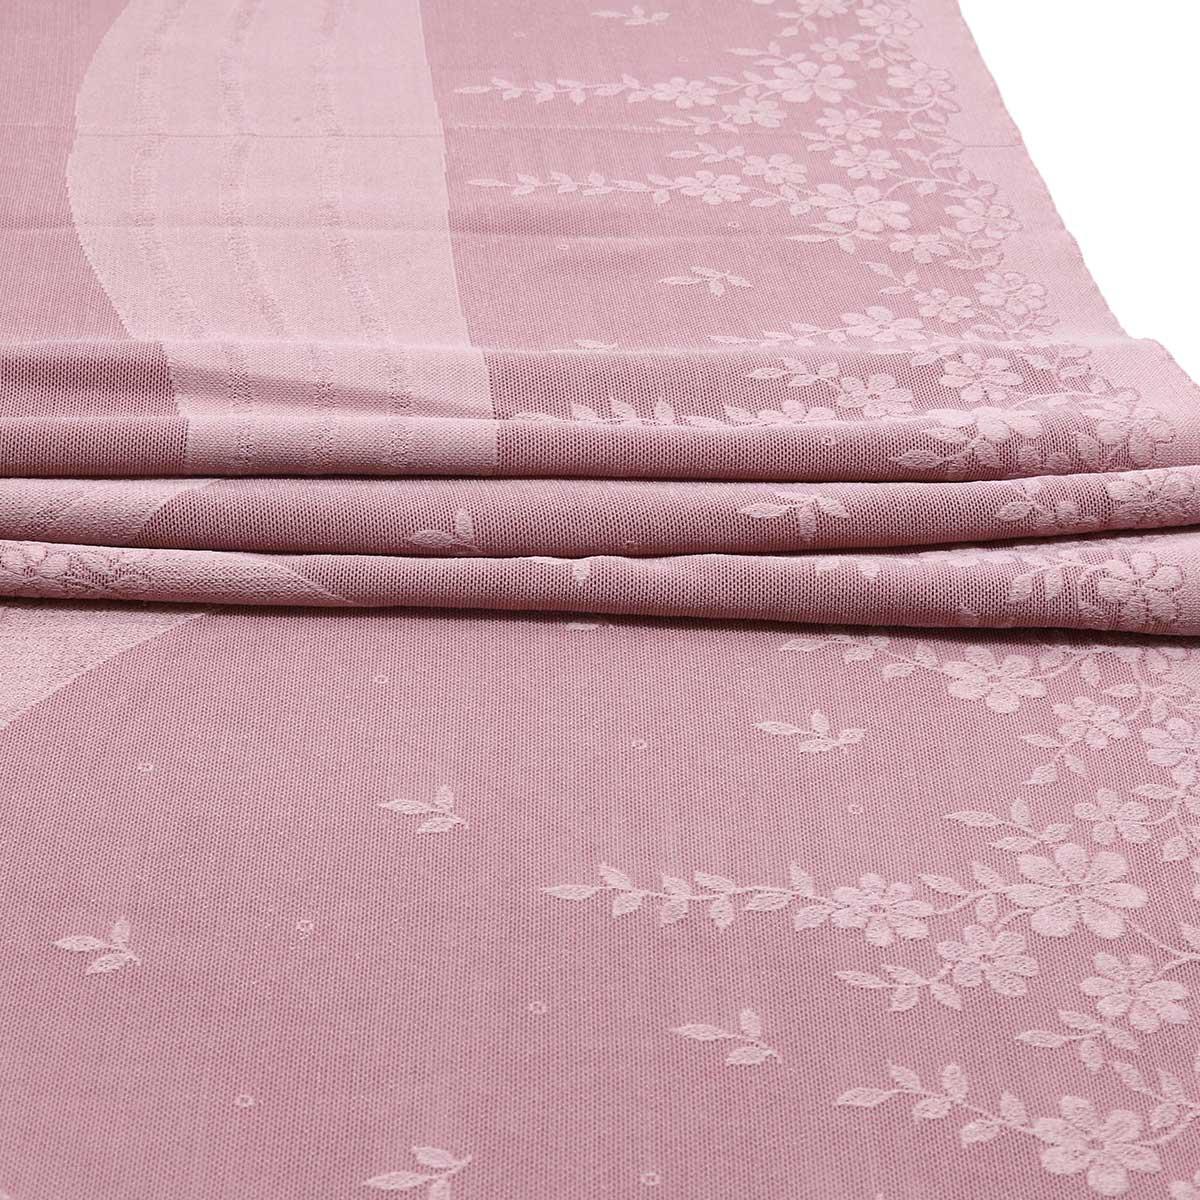 SU 134 Ткань эластичная бельевая 41 см*10